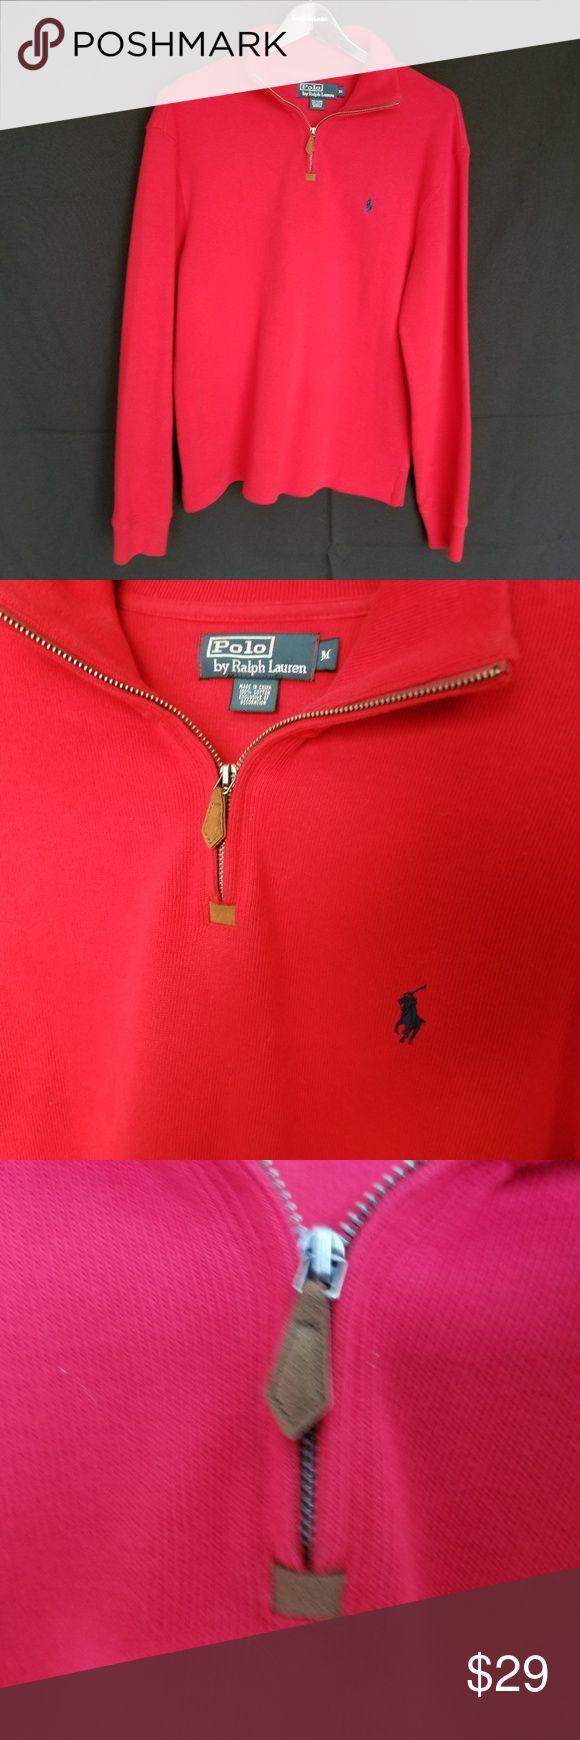 Polo Ralph Lauren Men's 1/2 Zip Pullover Sweater Polo Ralph Lauren Men's Half 1/2 Zip Pullover Sweater  Color: Red  Size: Medium   Almost new condition. Worn once. See Pics Polo by Ralph Lauren Sweaters Zip Up